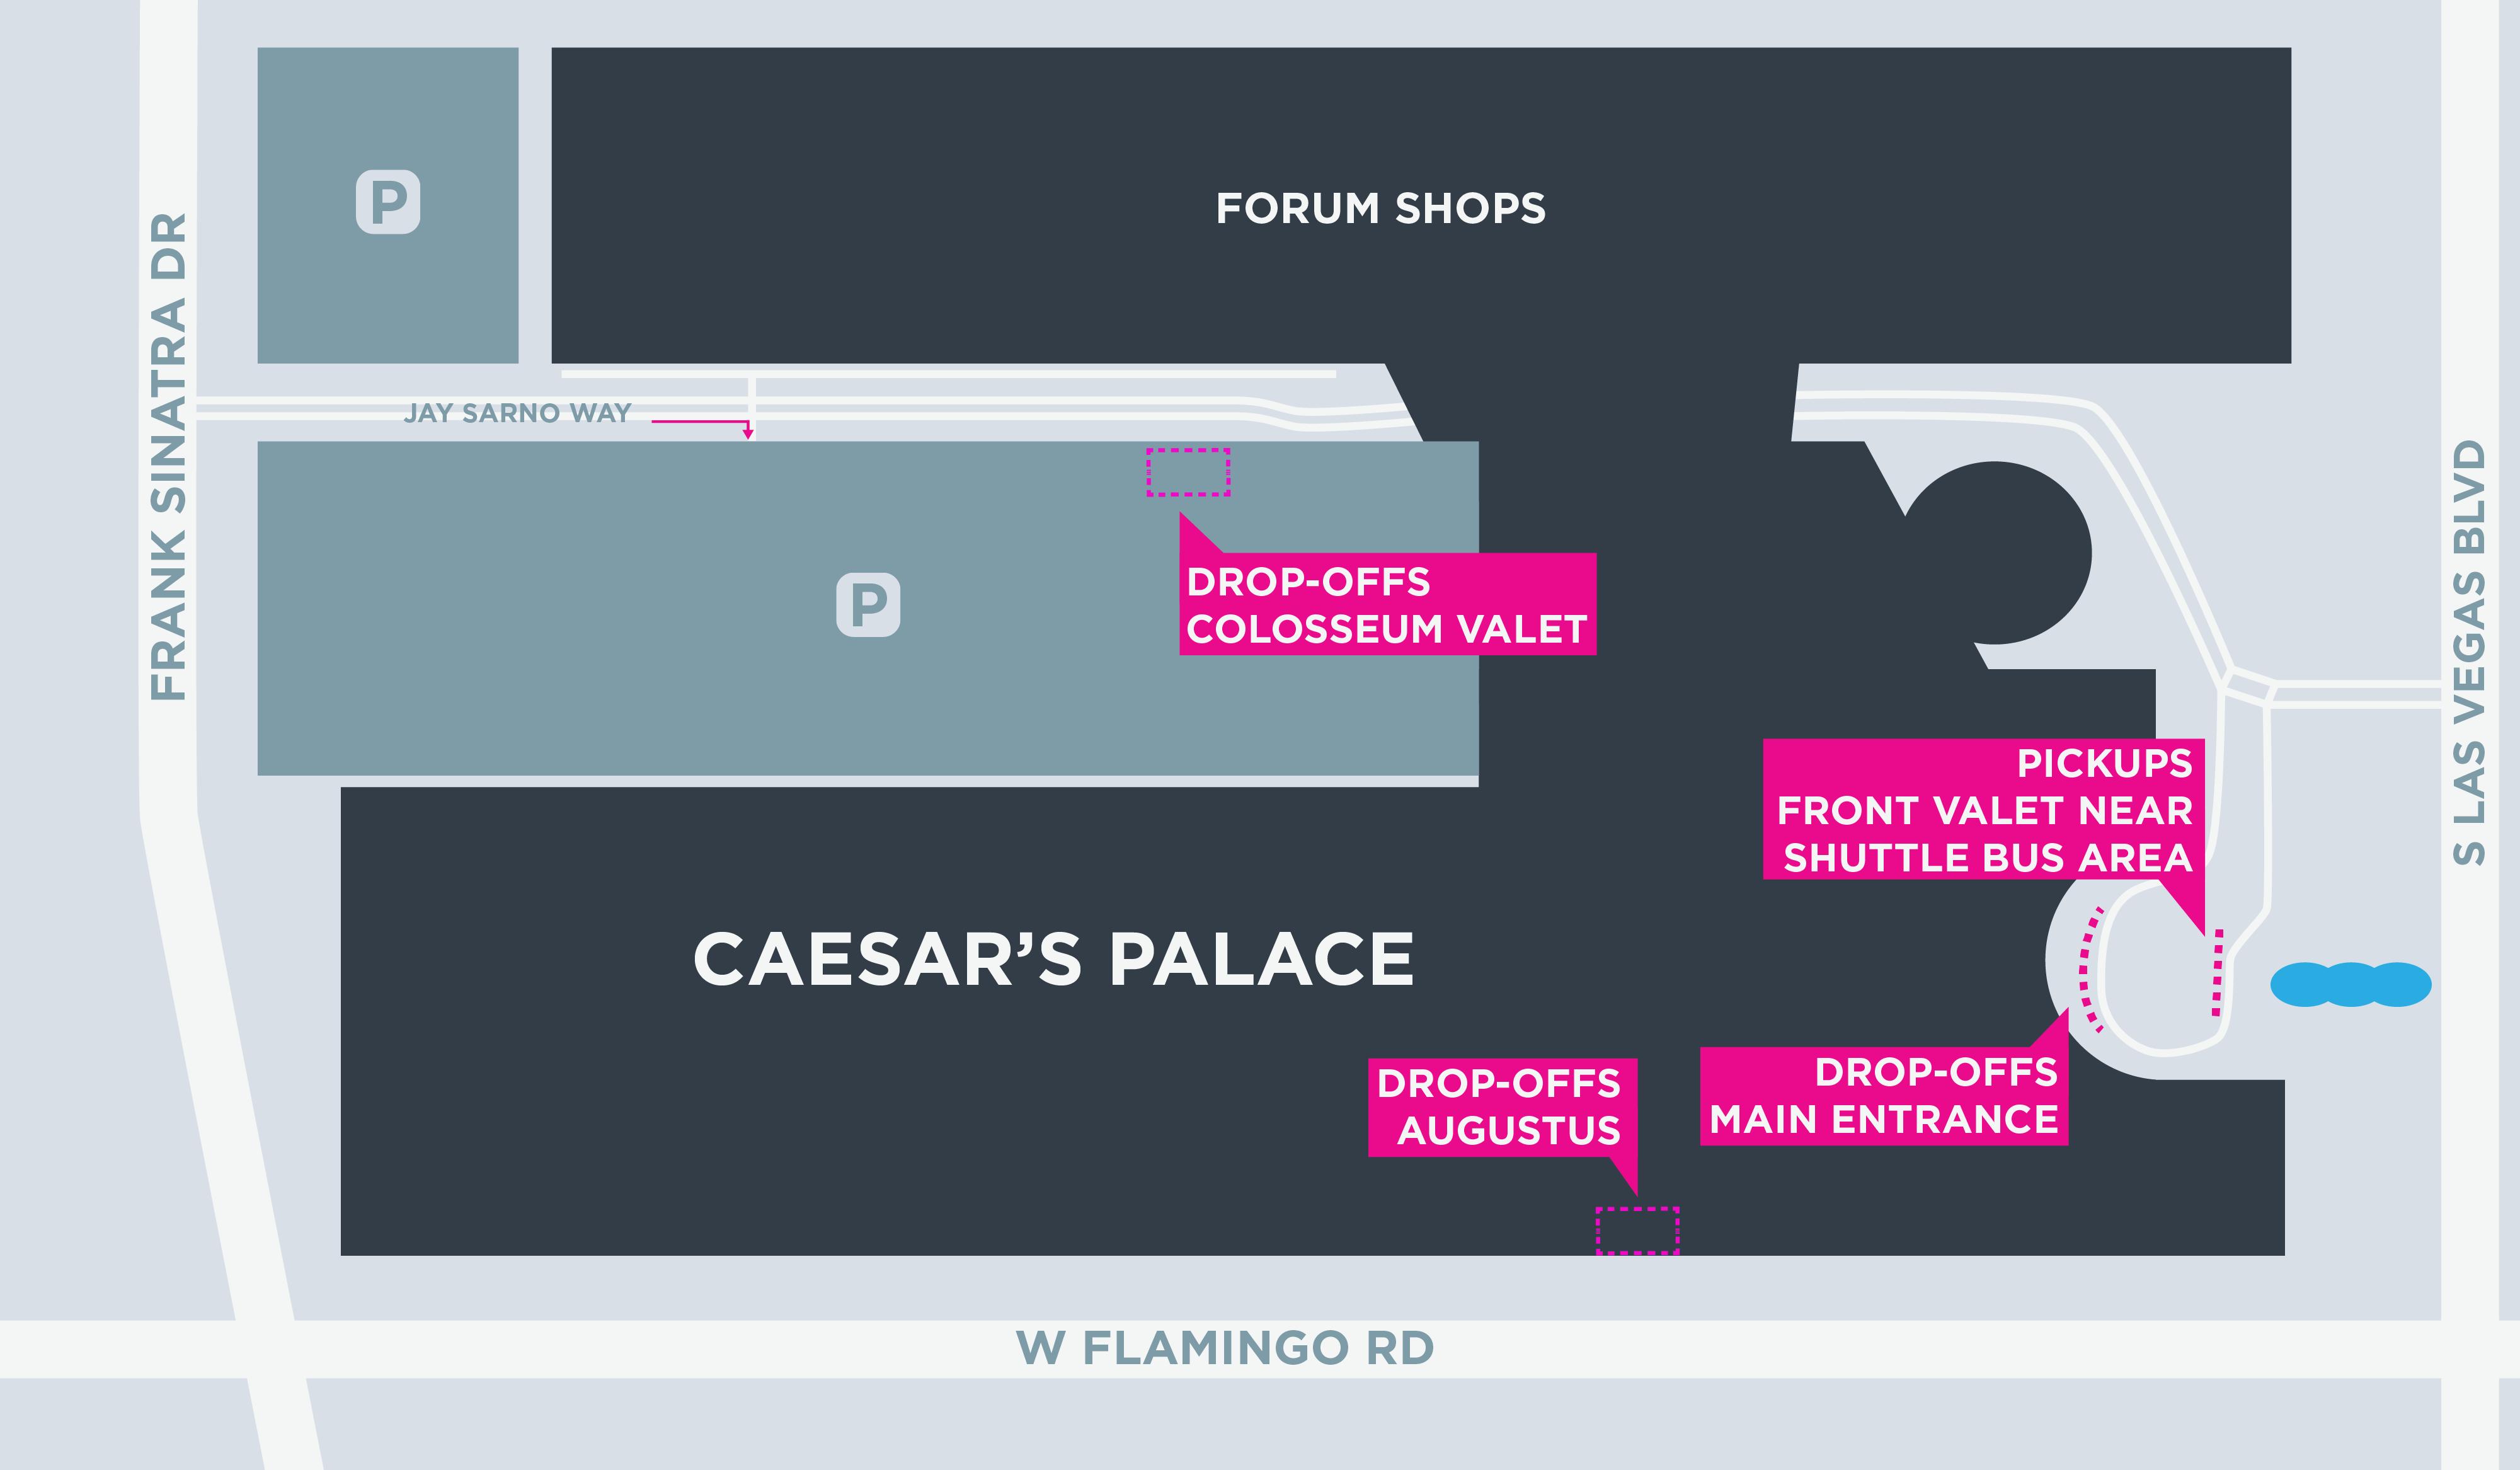 Caesar's Palace Map #LasVegas #casino #hotel #Strip #Lyft